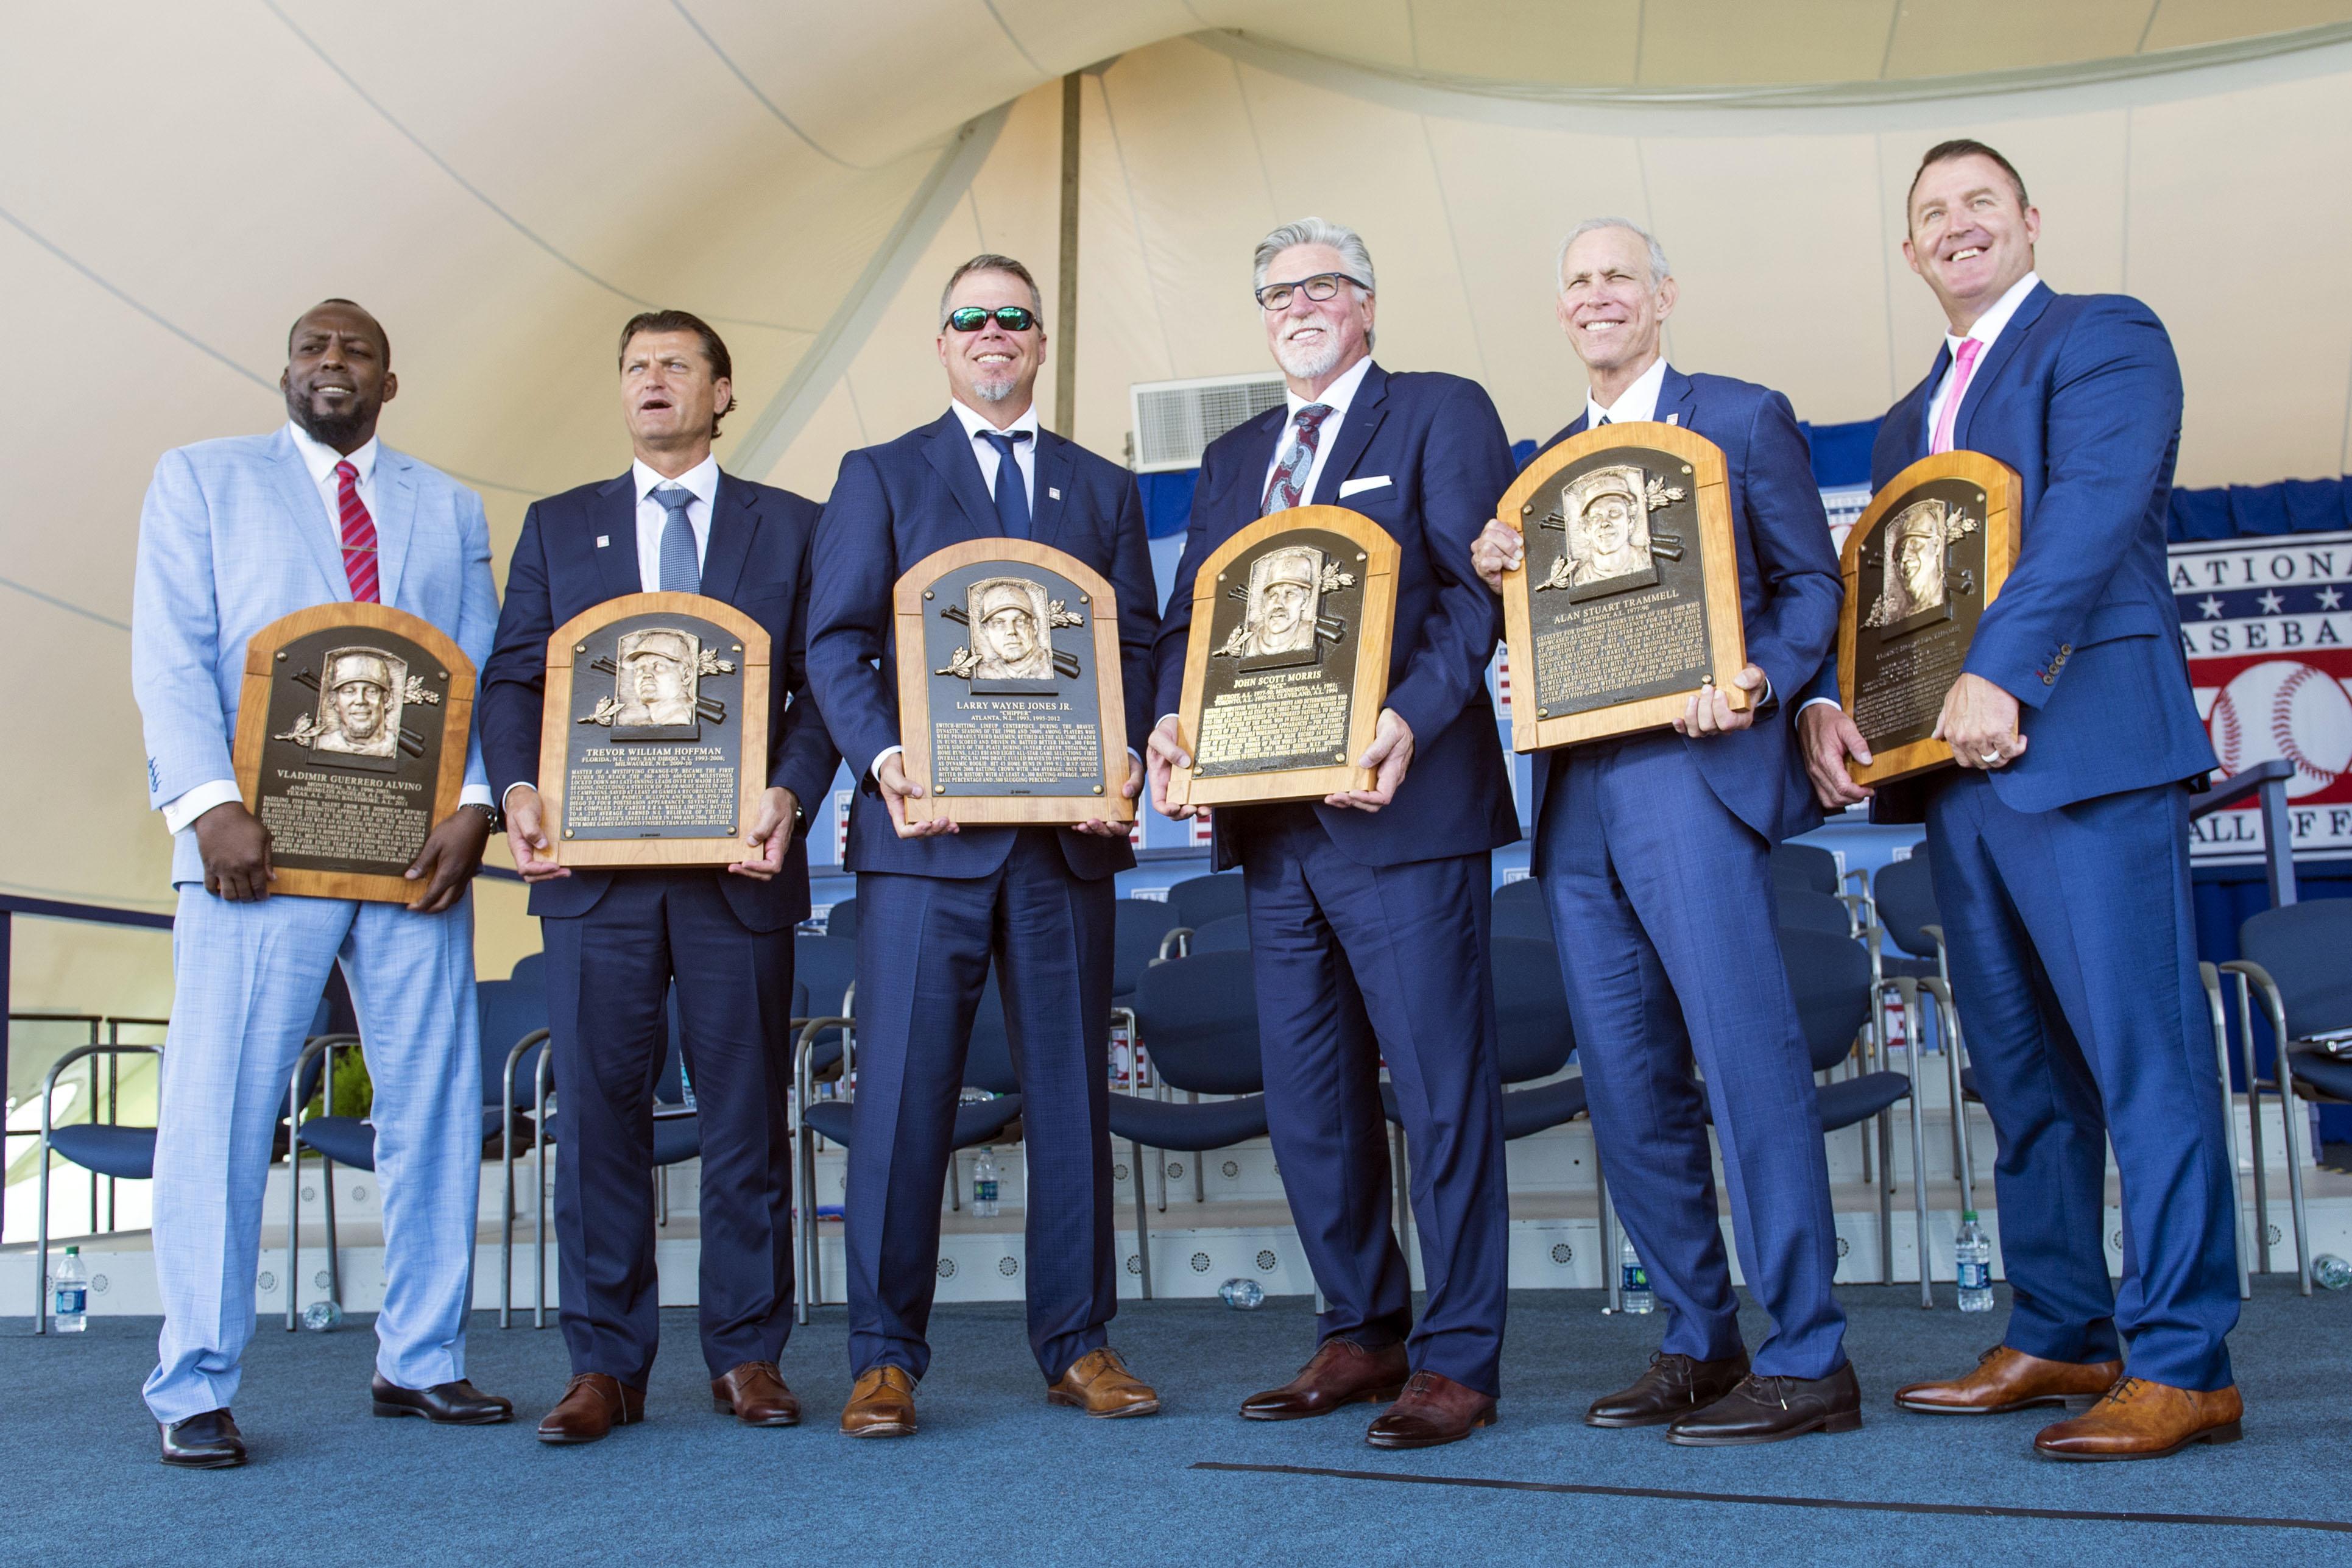 MLB: MLB: Baseball Hall of Fame-Induction Ceremony